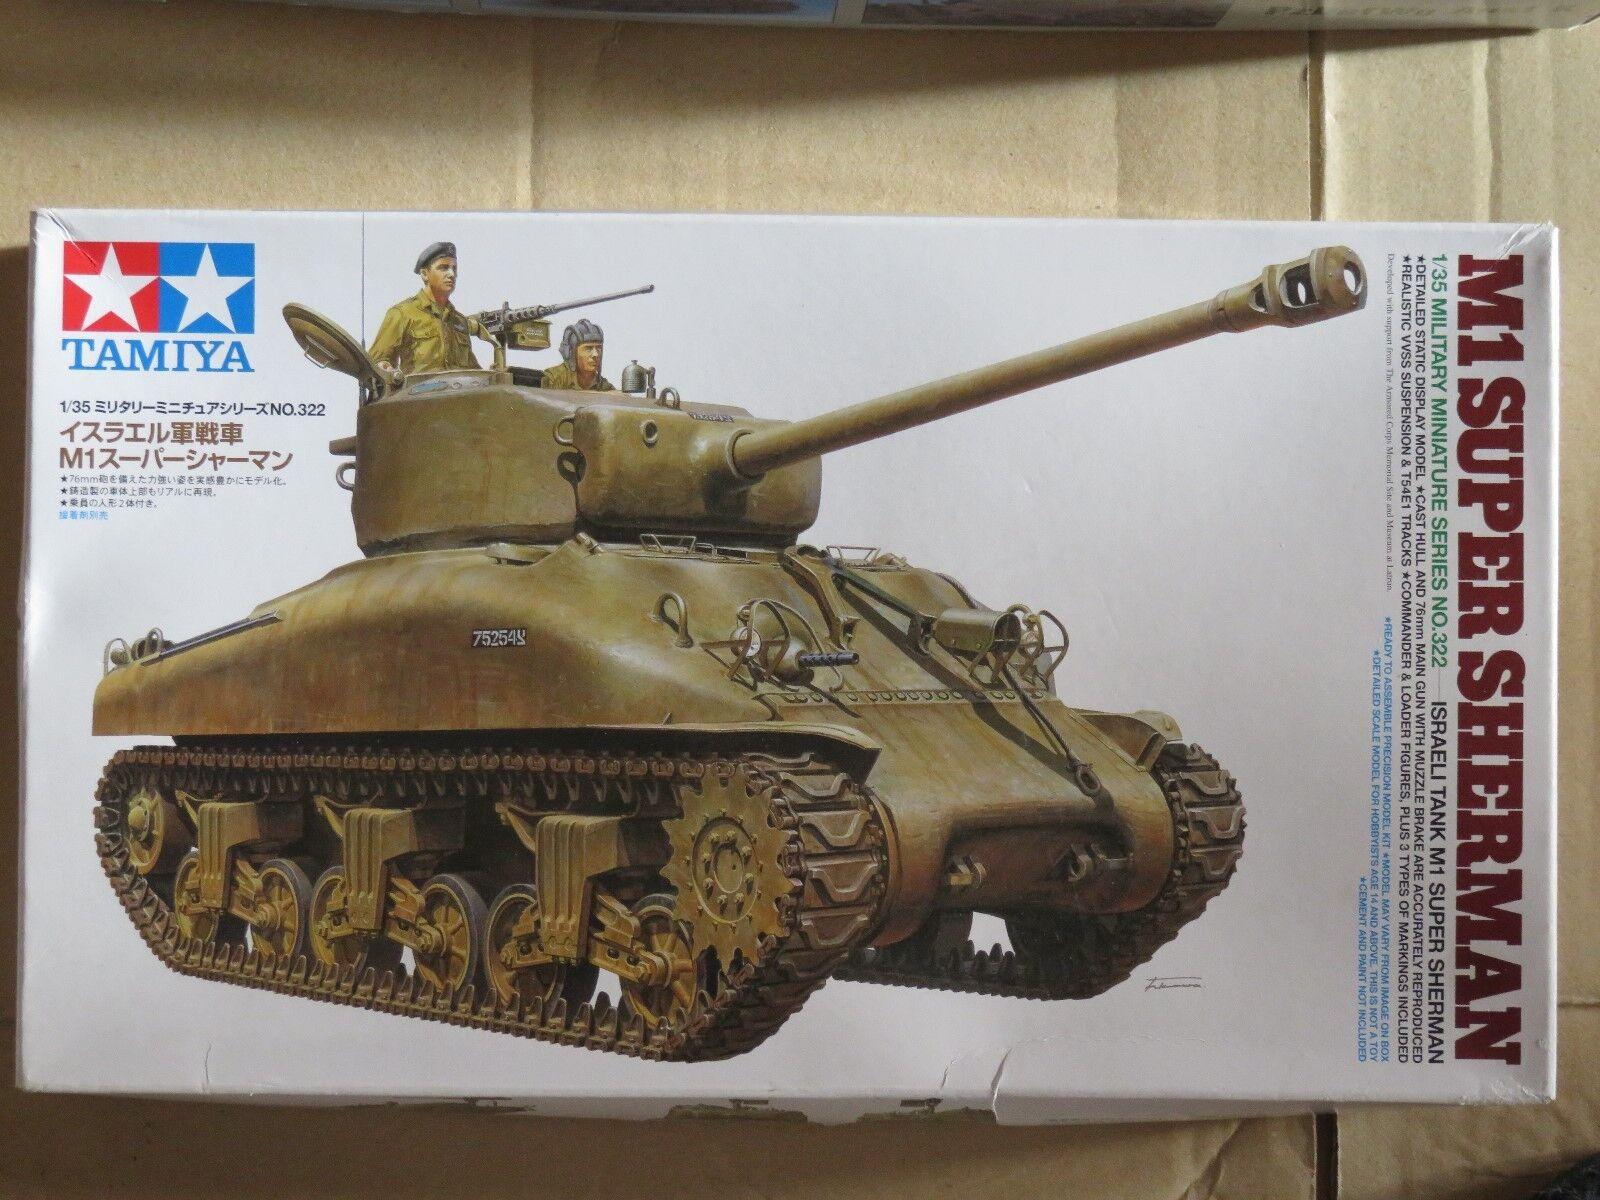 Tamiya 1 35 scale M1 Super Sherman